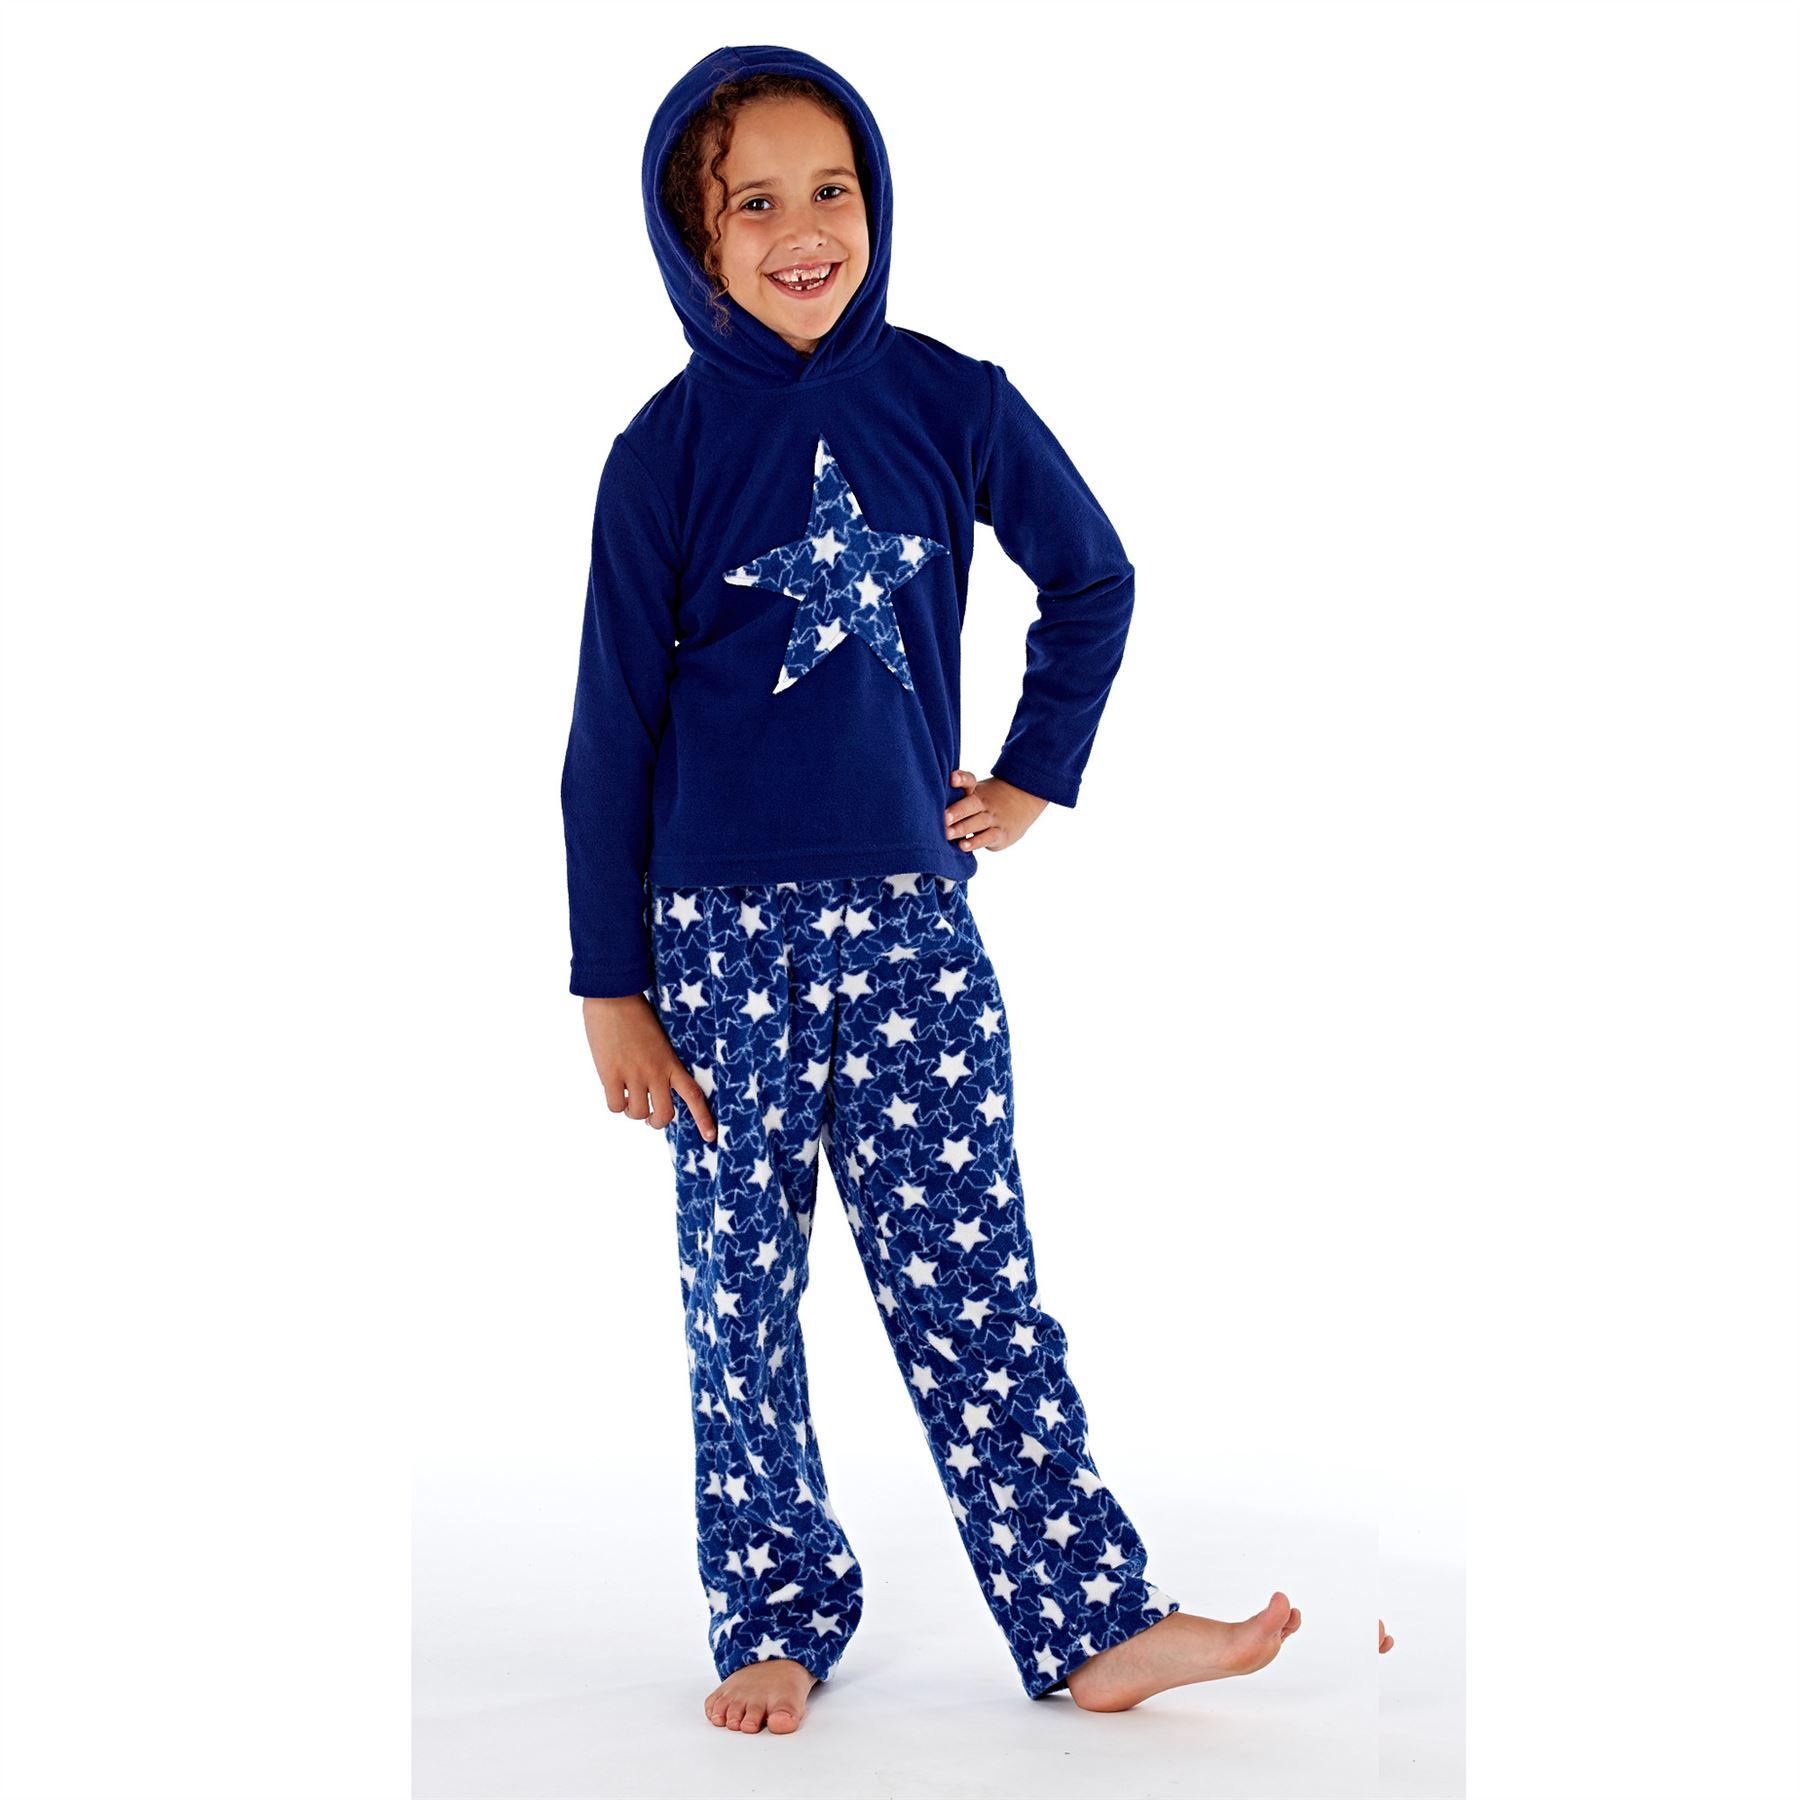 Girls//Boys Fleece Pyjamas Childrens Pyjama Set Kids PJs Age 2-13 Years